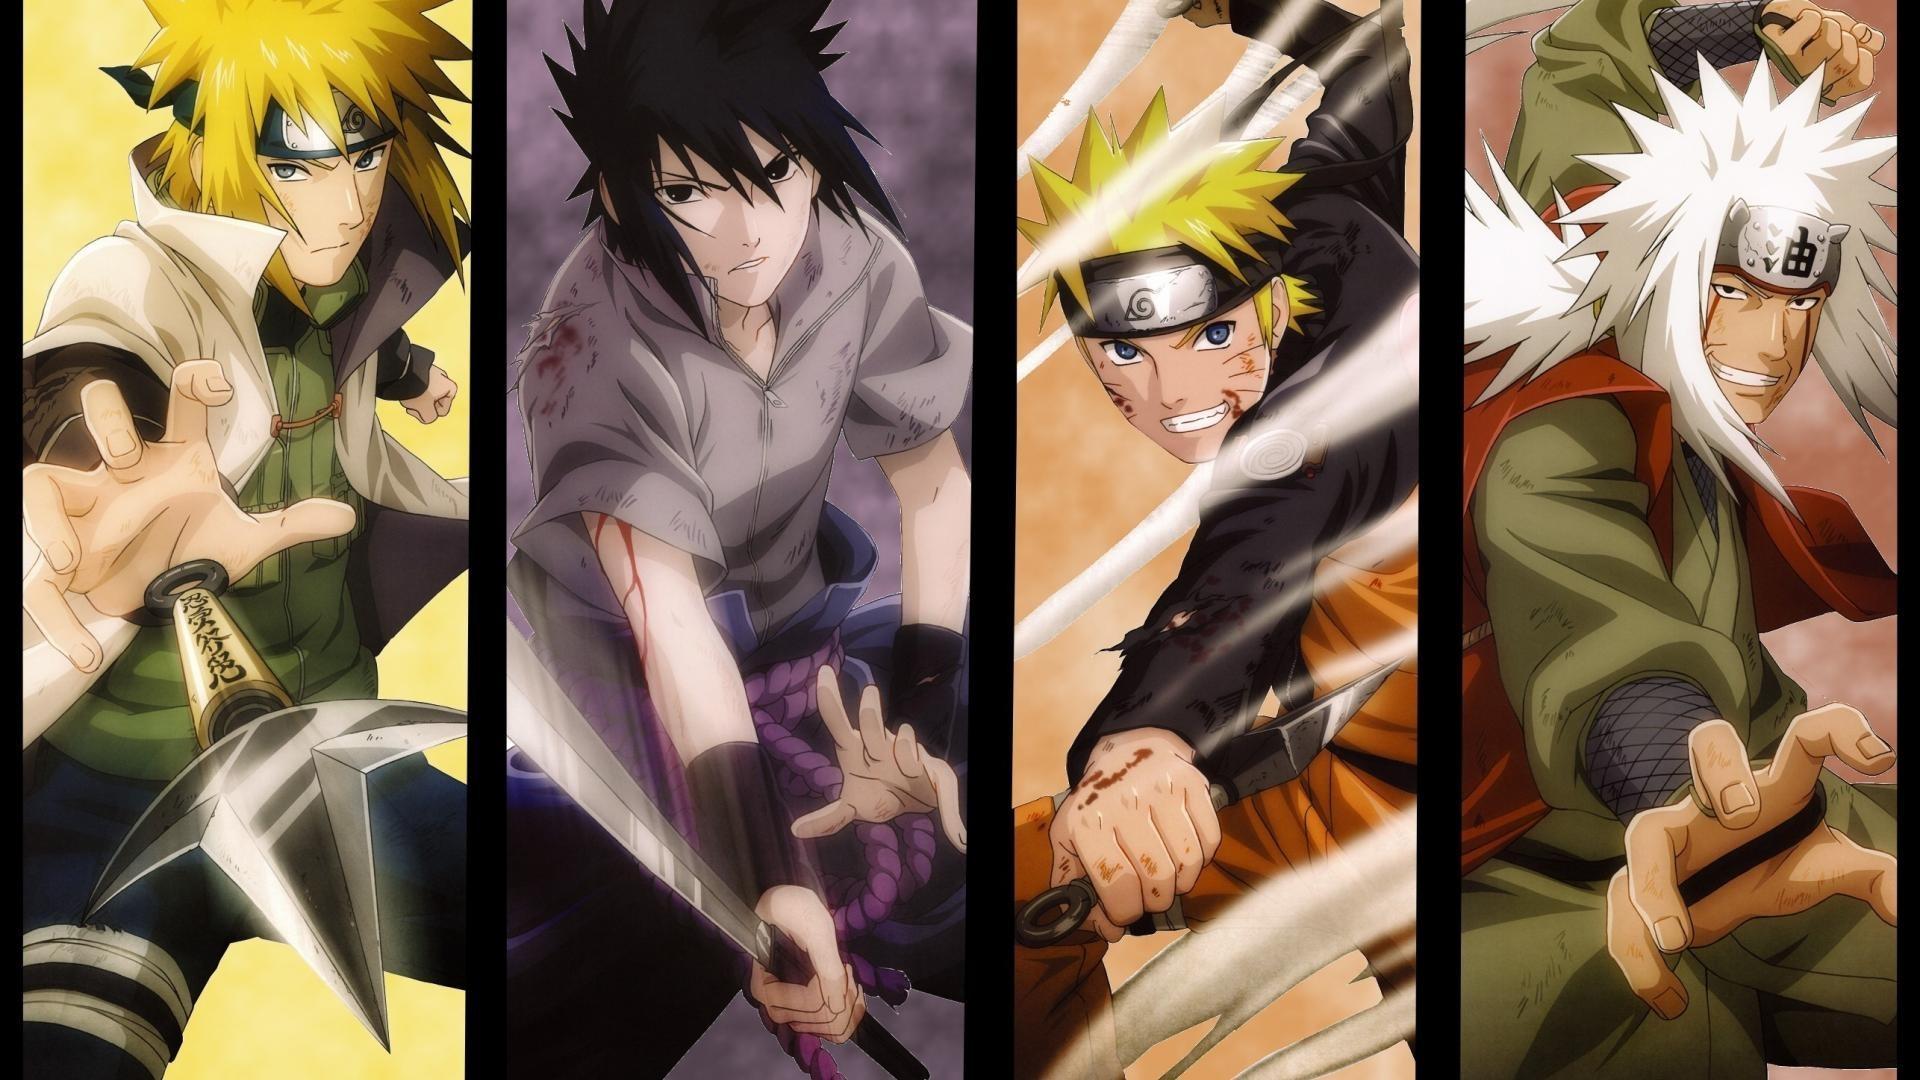 Naruto Shippuuden, Hokage, Anime, Namikaze Minato, Uchiha Sasuke, Uzumaki  Naruto, Jiraiya, Panels Wallpapers HD / Desktop and Mobile Backgrounds